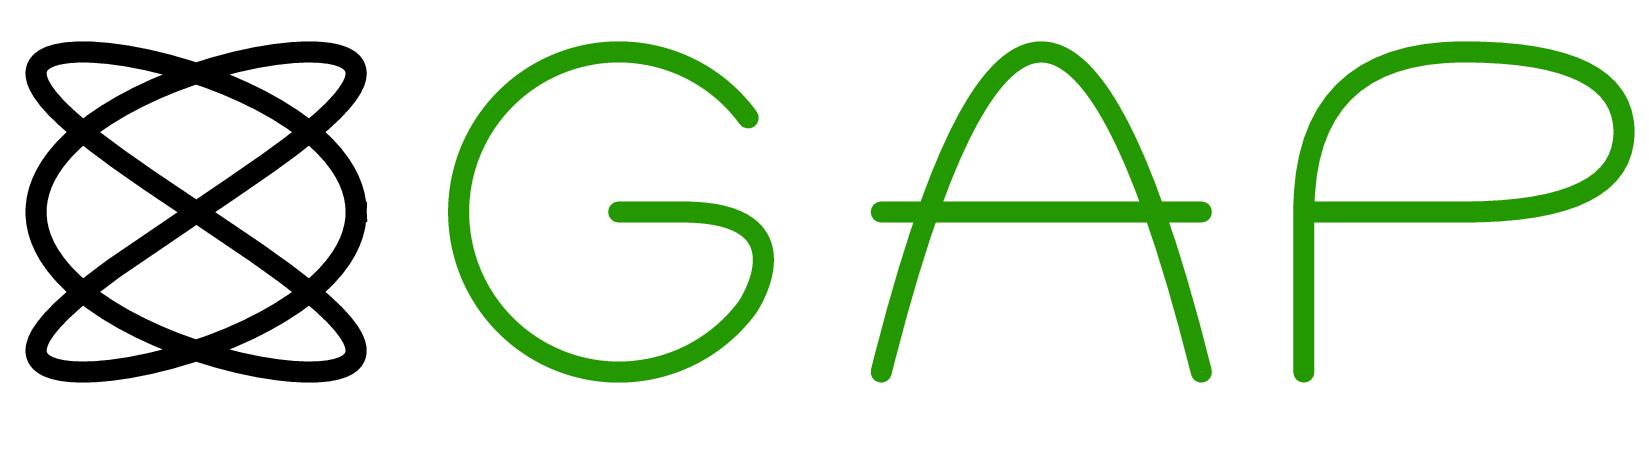 Graduate Association of Physicists